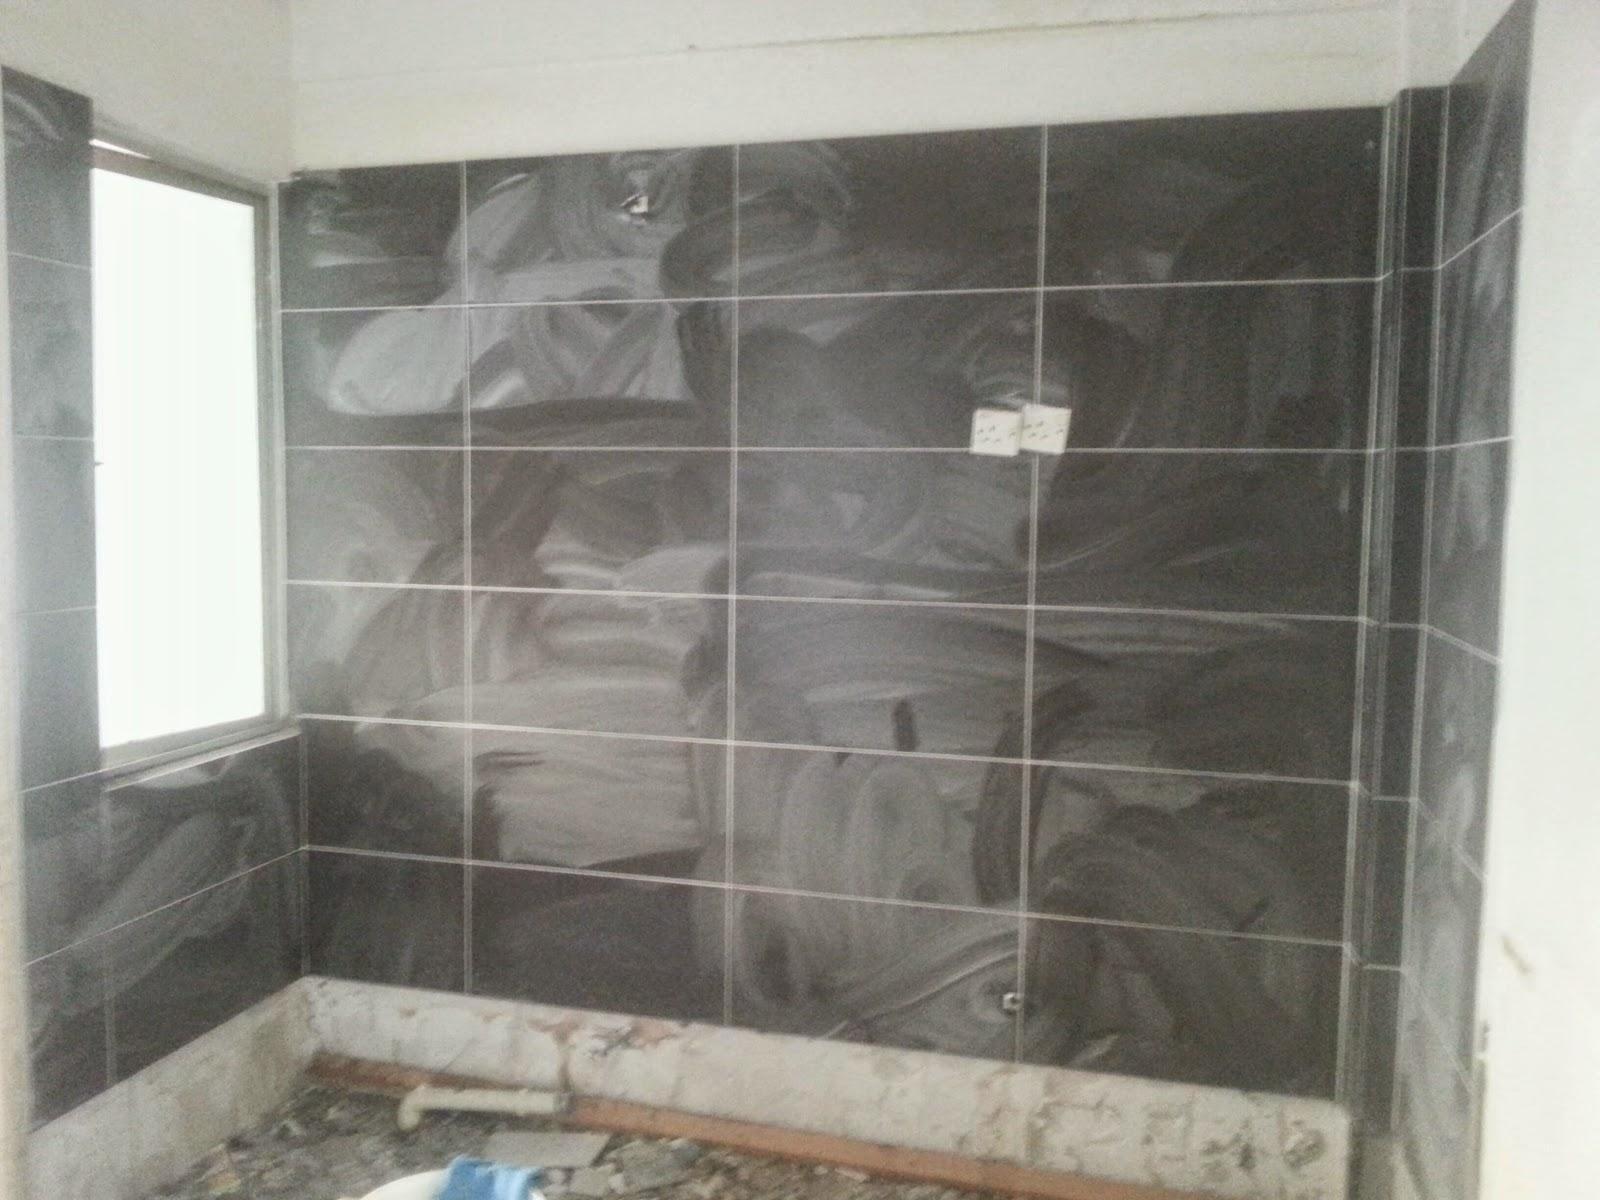 Ubahsuai Rumah House Renovation Memasang Tile Dapur 1 2sq Warna Hitam Lantai 1sq Nanti Kat Dinding Seperti Dalam Gambar Ade Buat